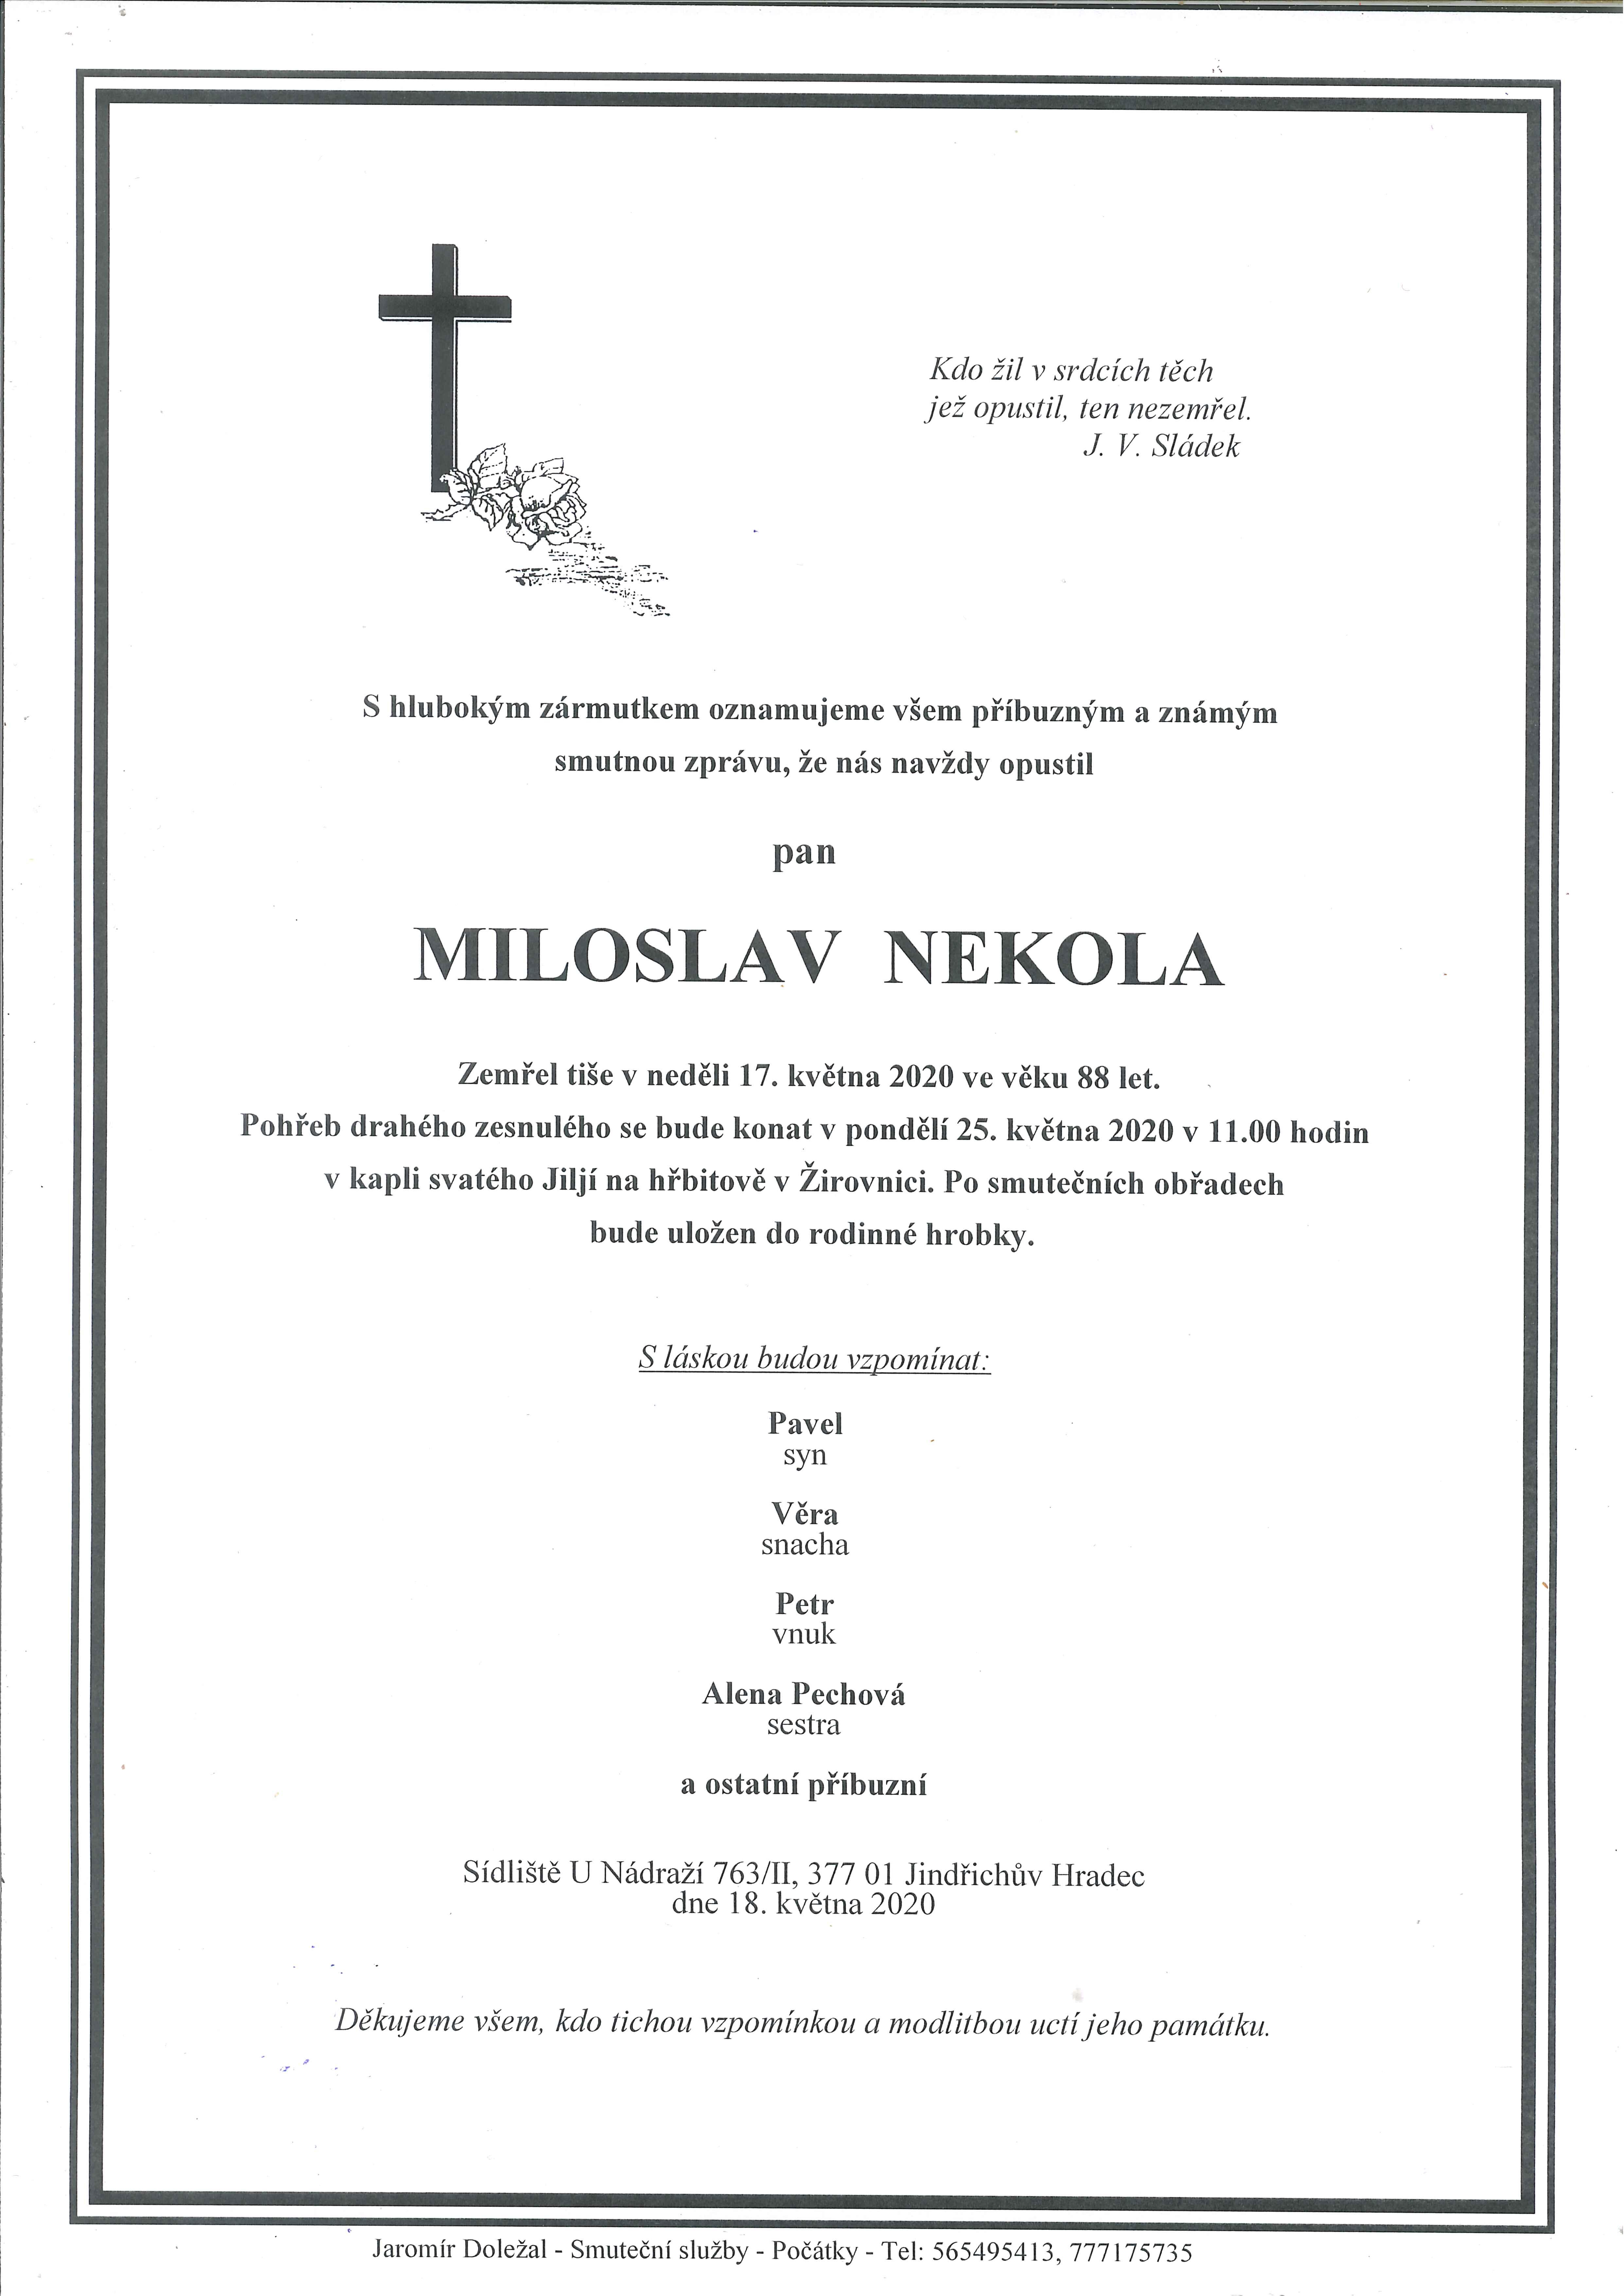 MILOSLAV NEKOLA